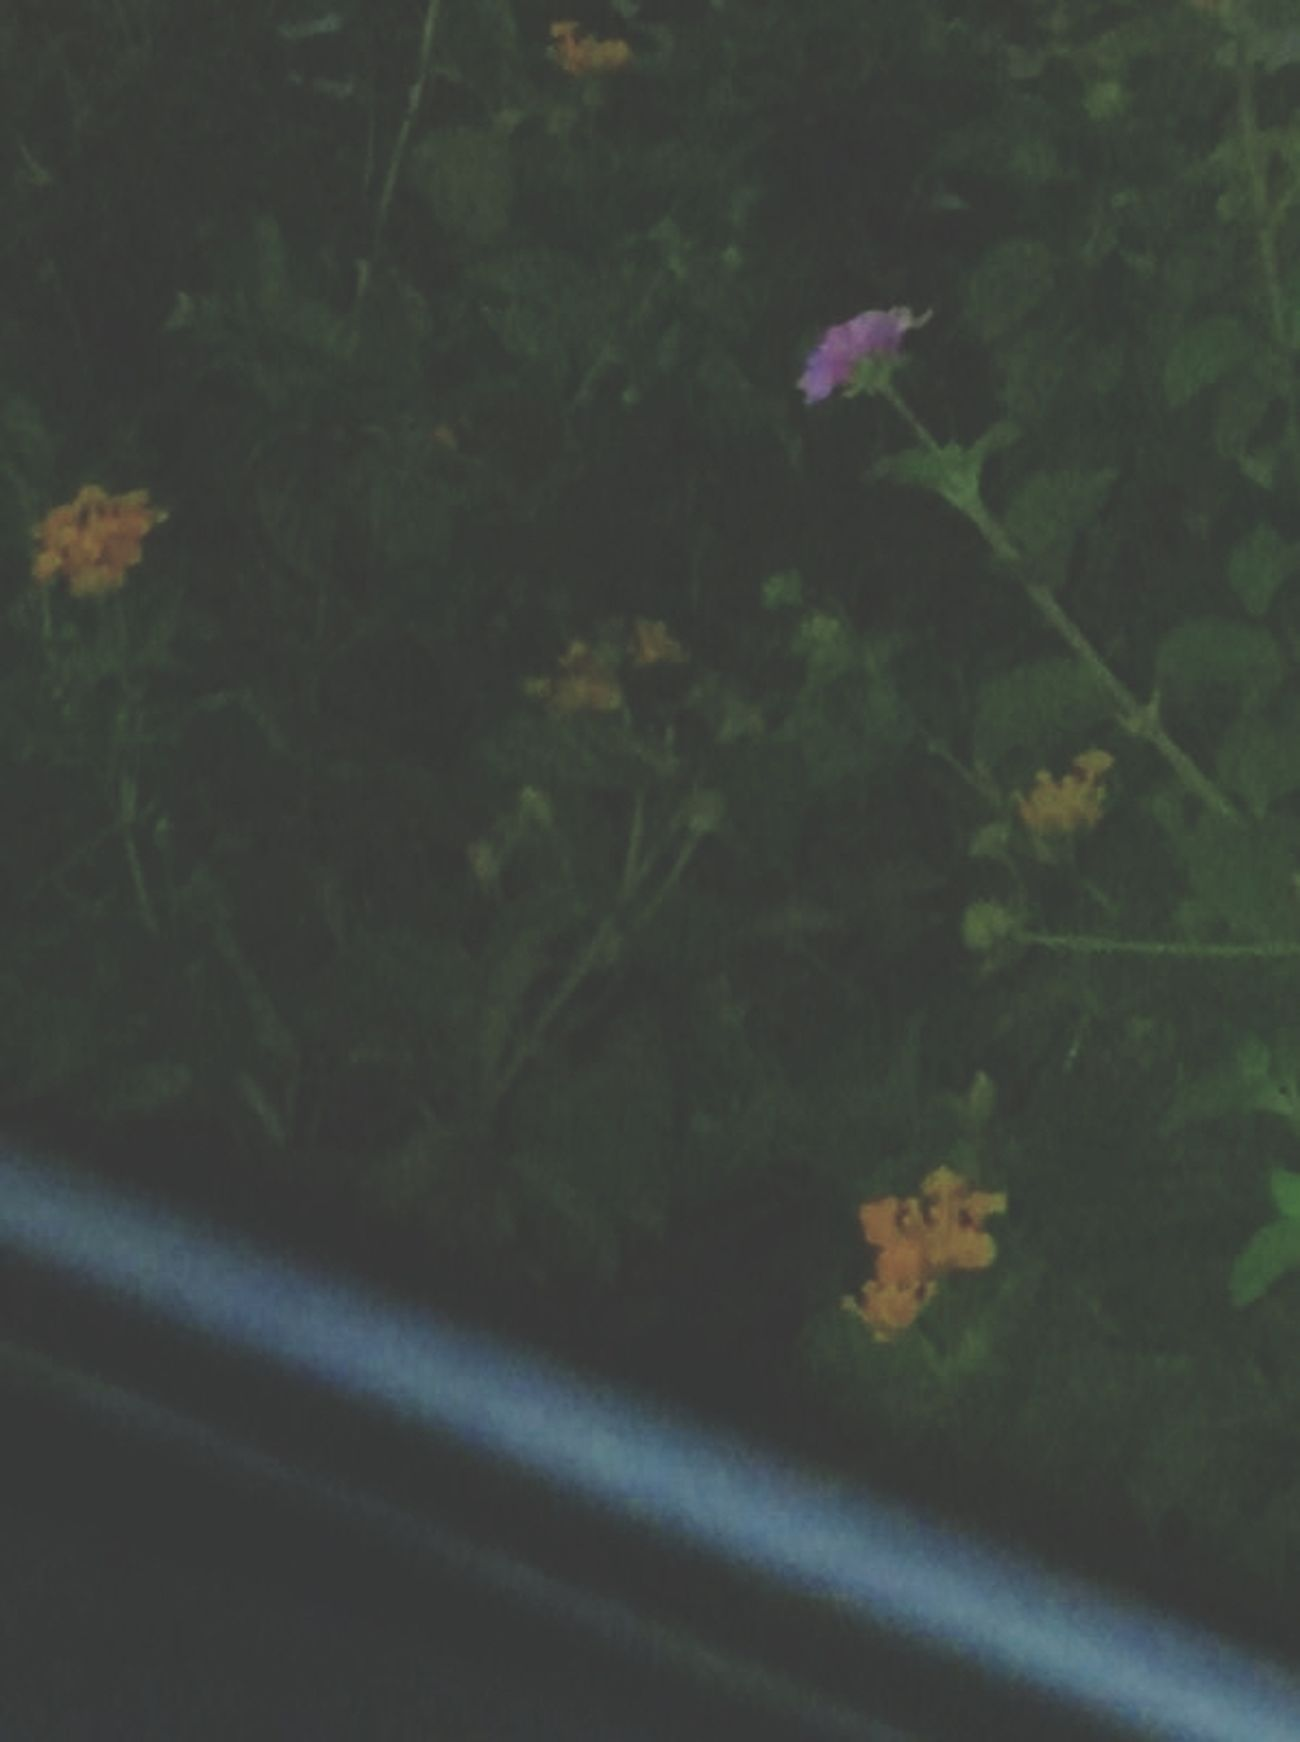 Flowers Nature Zoanna Davida 246